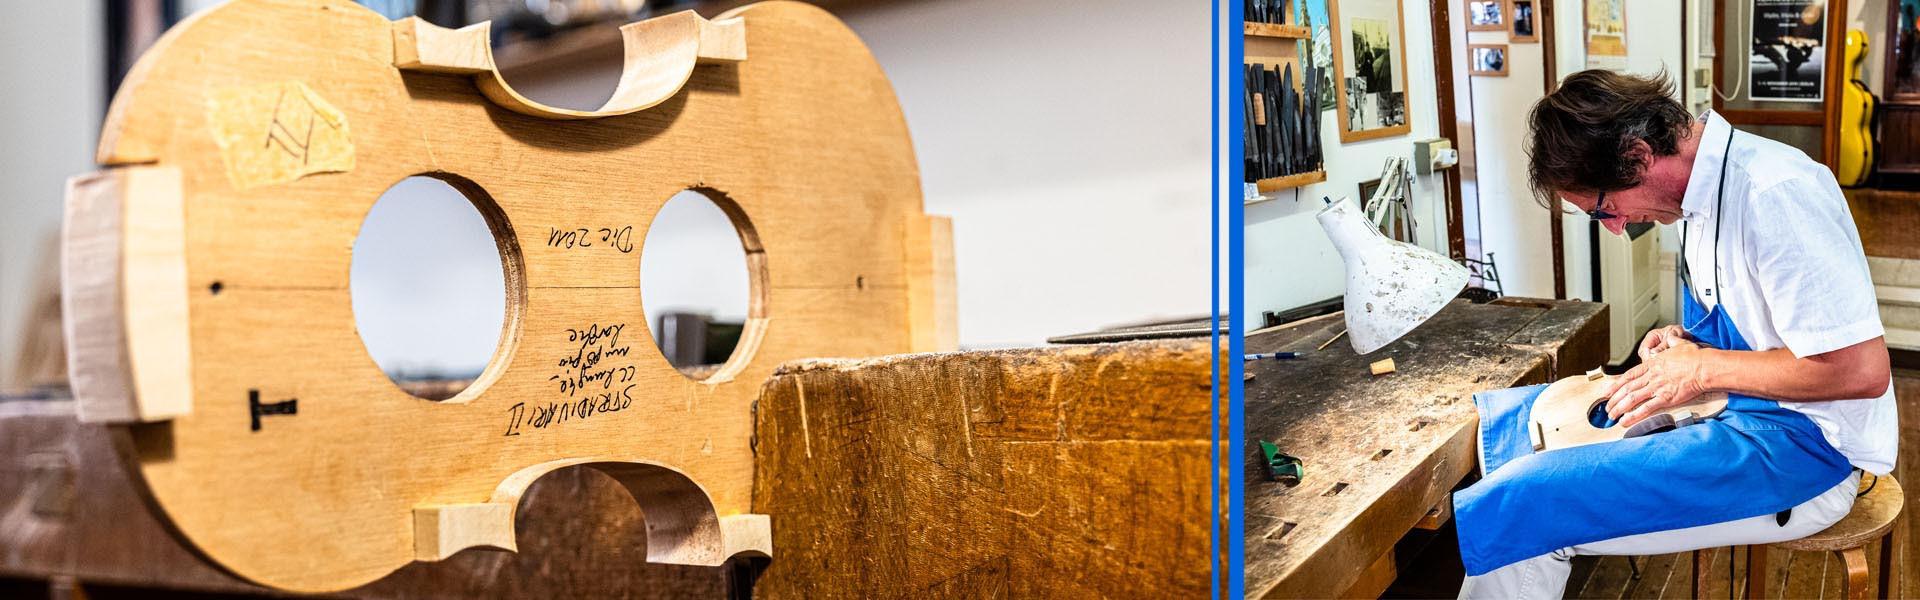 Artspace - Stradivari